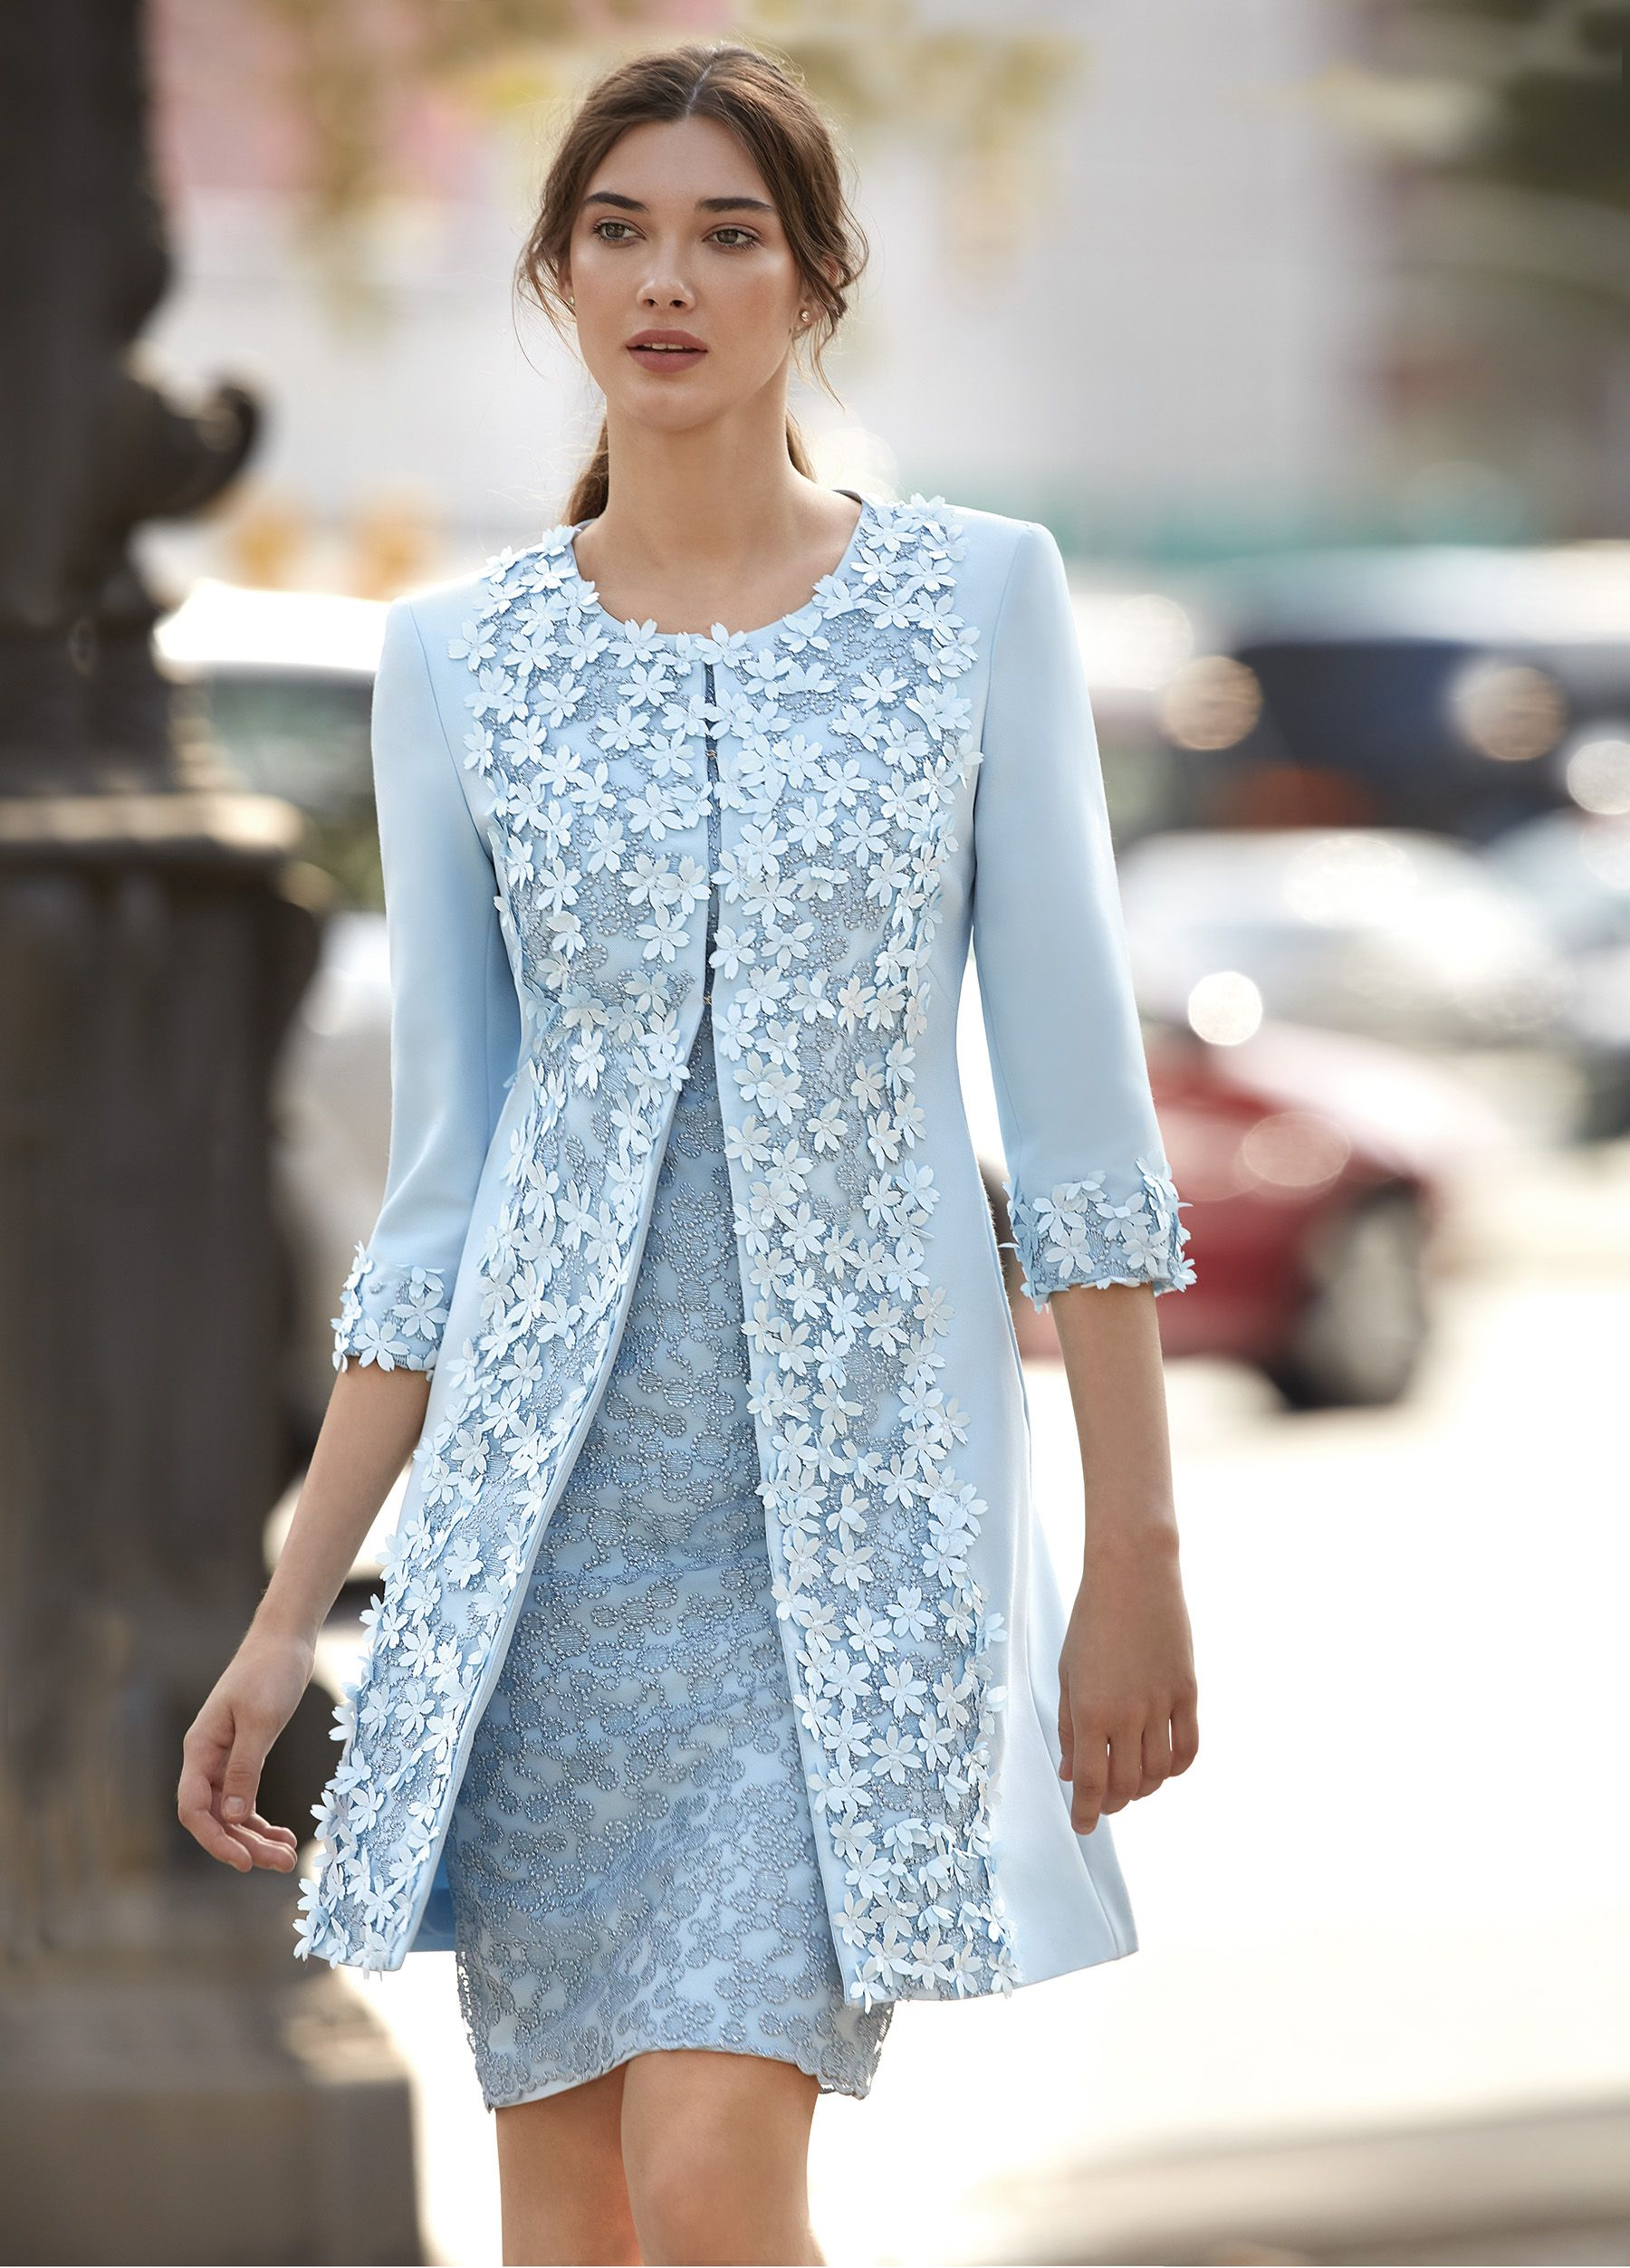 94537 - Carla Ruiz | Mother of the groom dresses | Pinterest | Bride ...